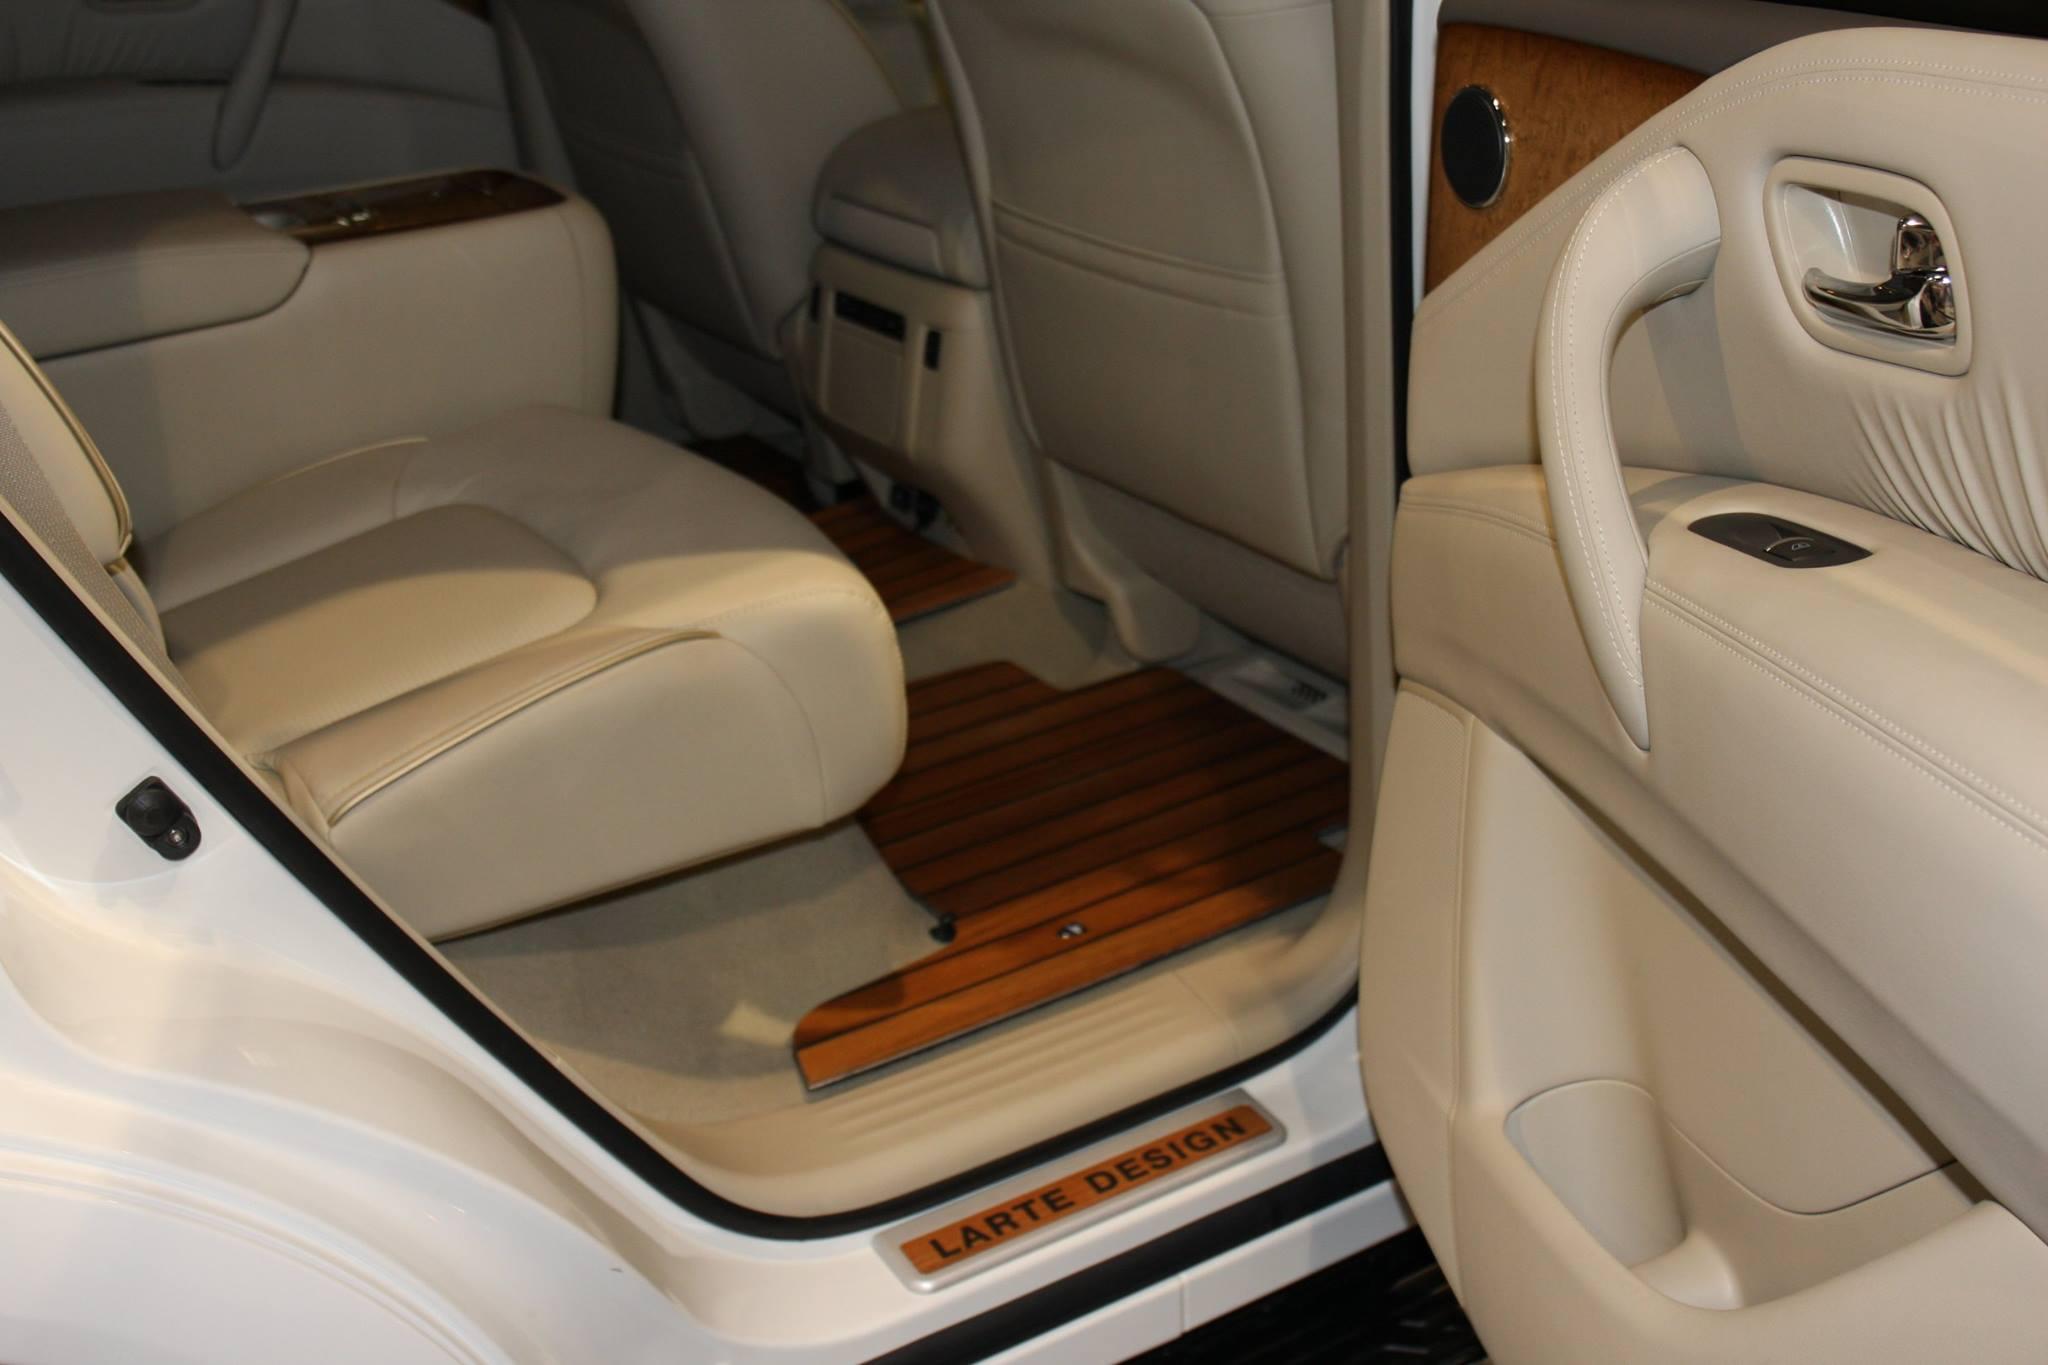 Infiniti Qx80 Interior Gets Decked In Teak Wood Trim